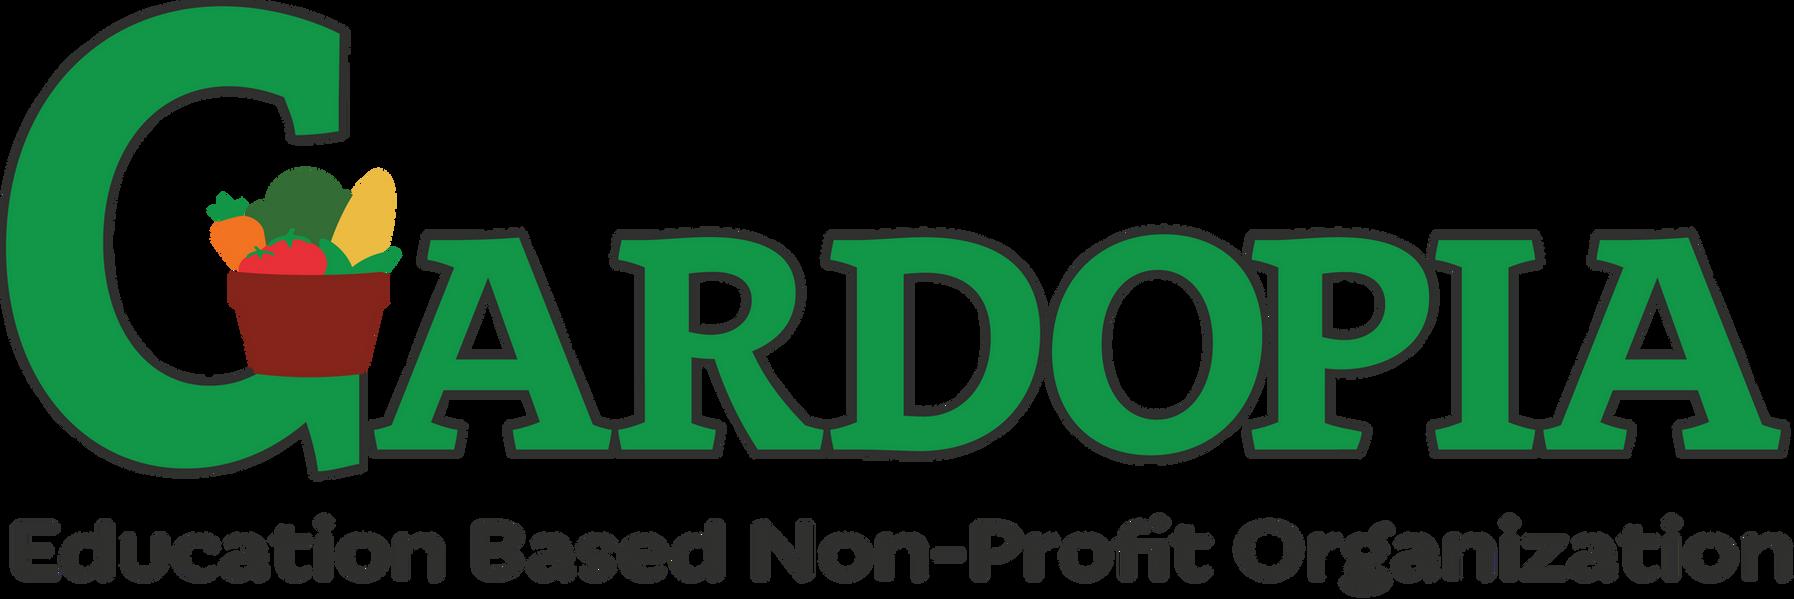 Gardopia Education Based Non-Profit Orga